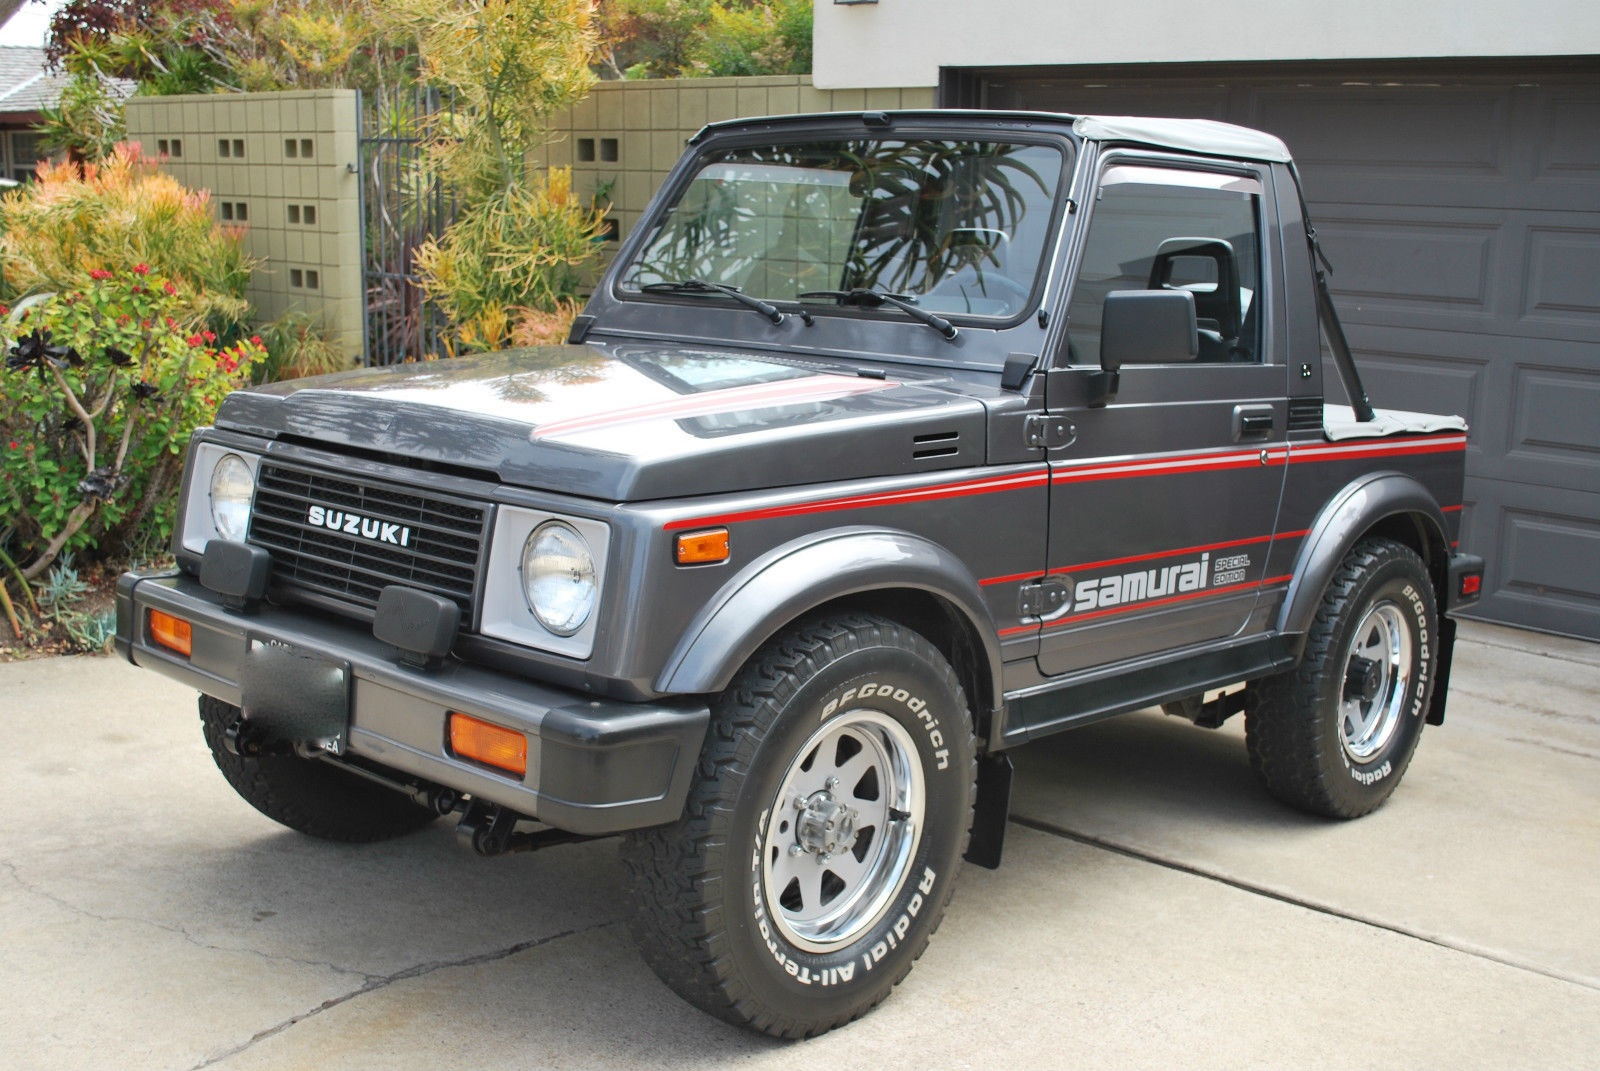 Suzuki Jeep Samurai Parts